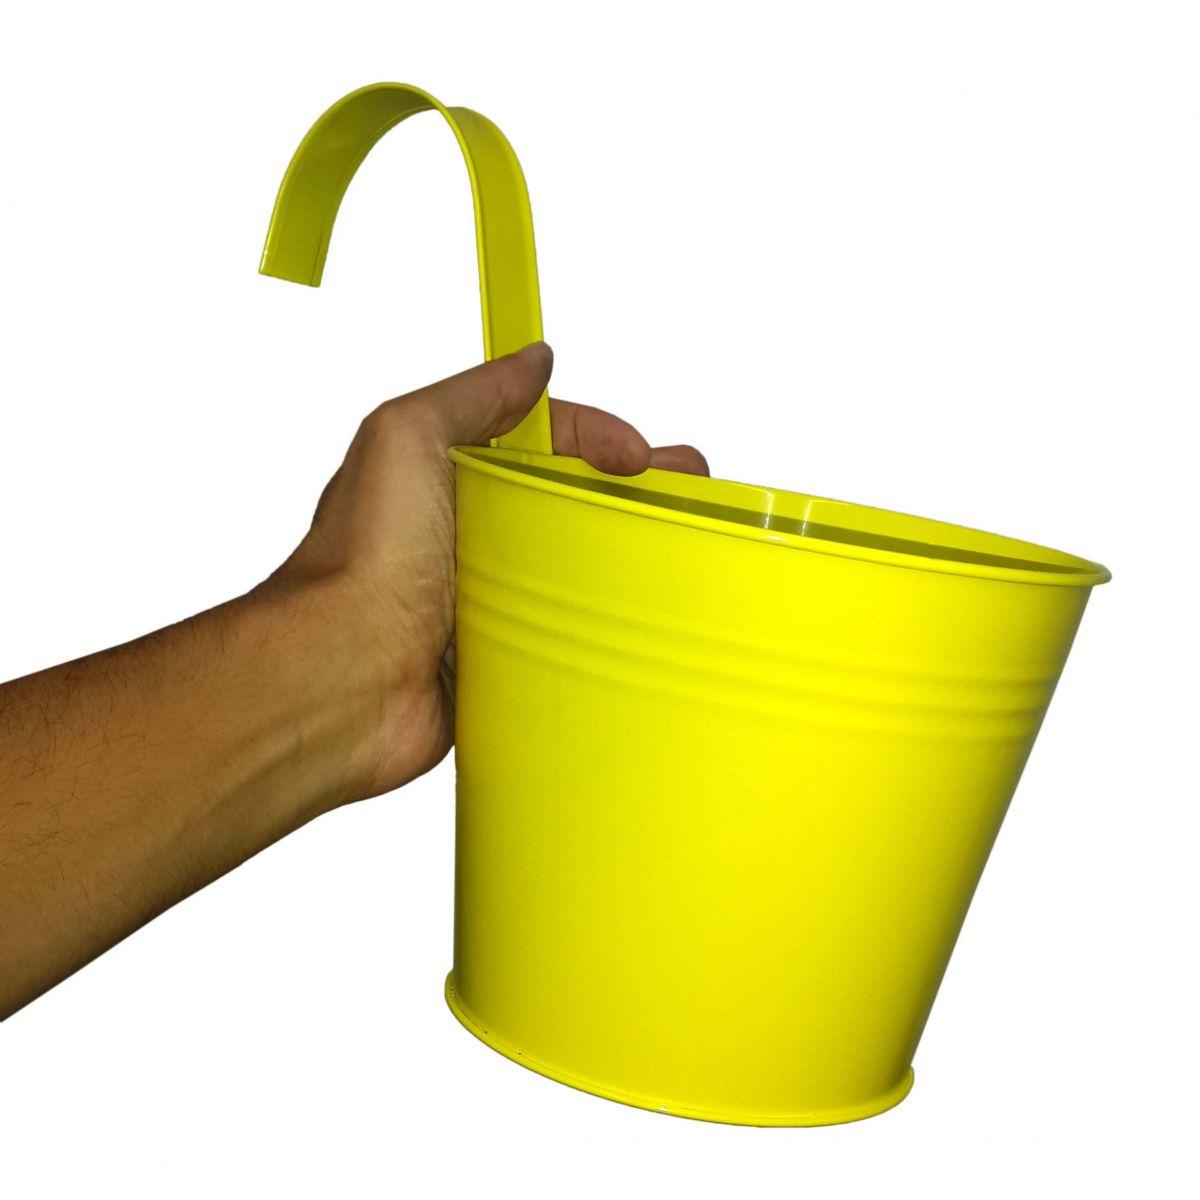 Conjunto Com 2 Cachepot De Metal Para Jardim Suspenso Vertical Grande Amarelo (cachepo-3)